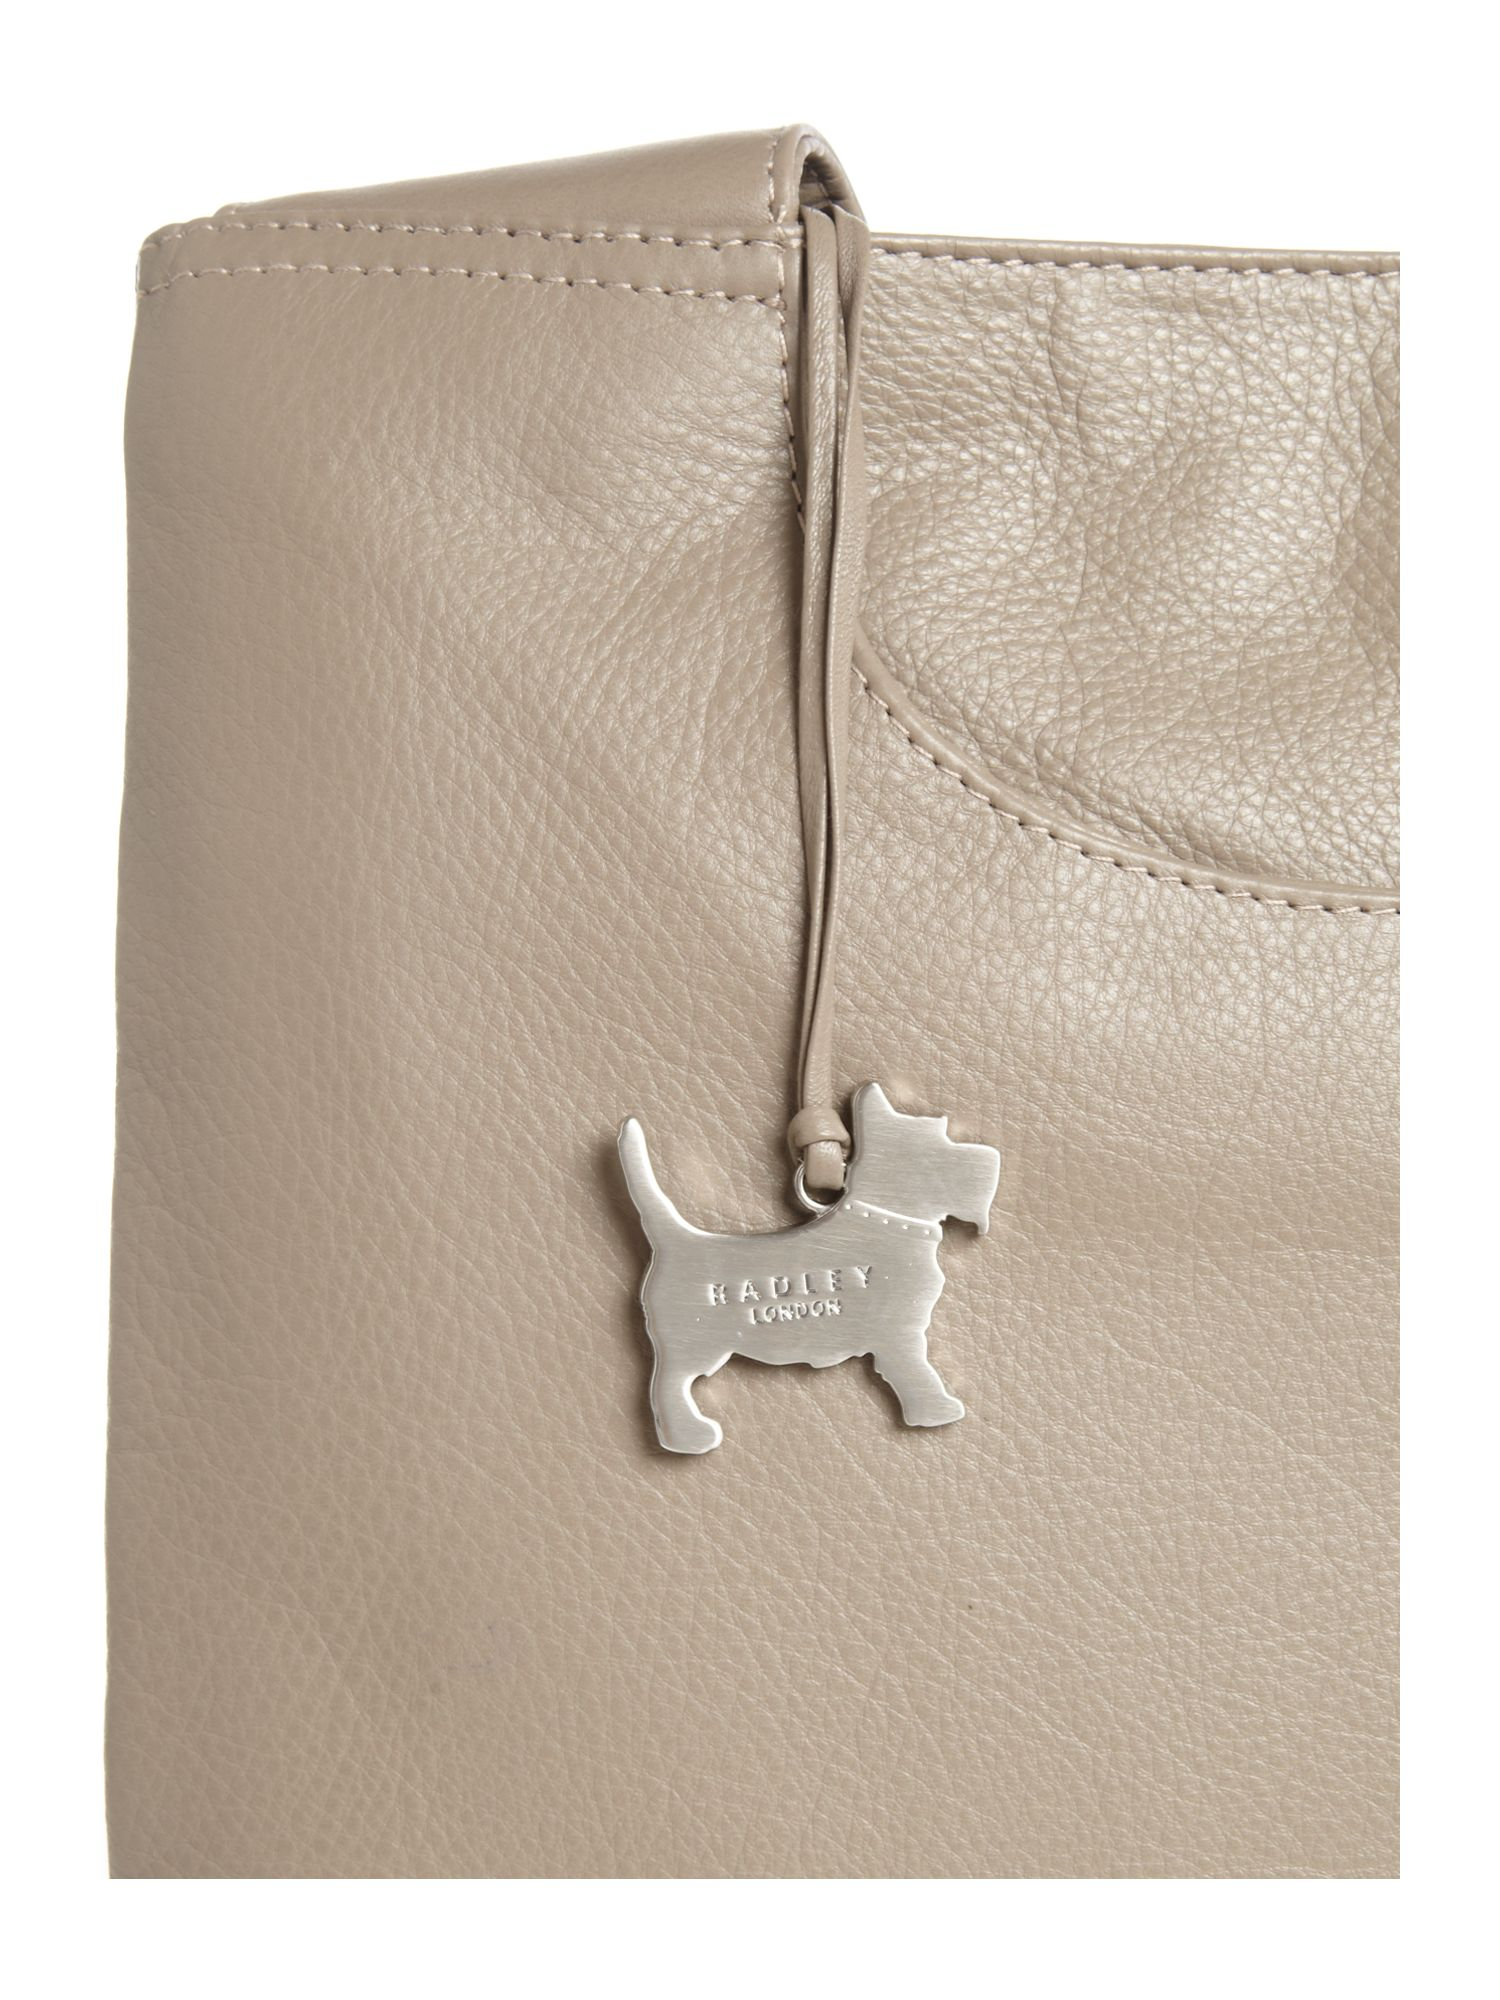 Radley Pocket Bag Medium Cross Body Bag in Grey (Natural)